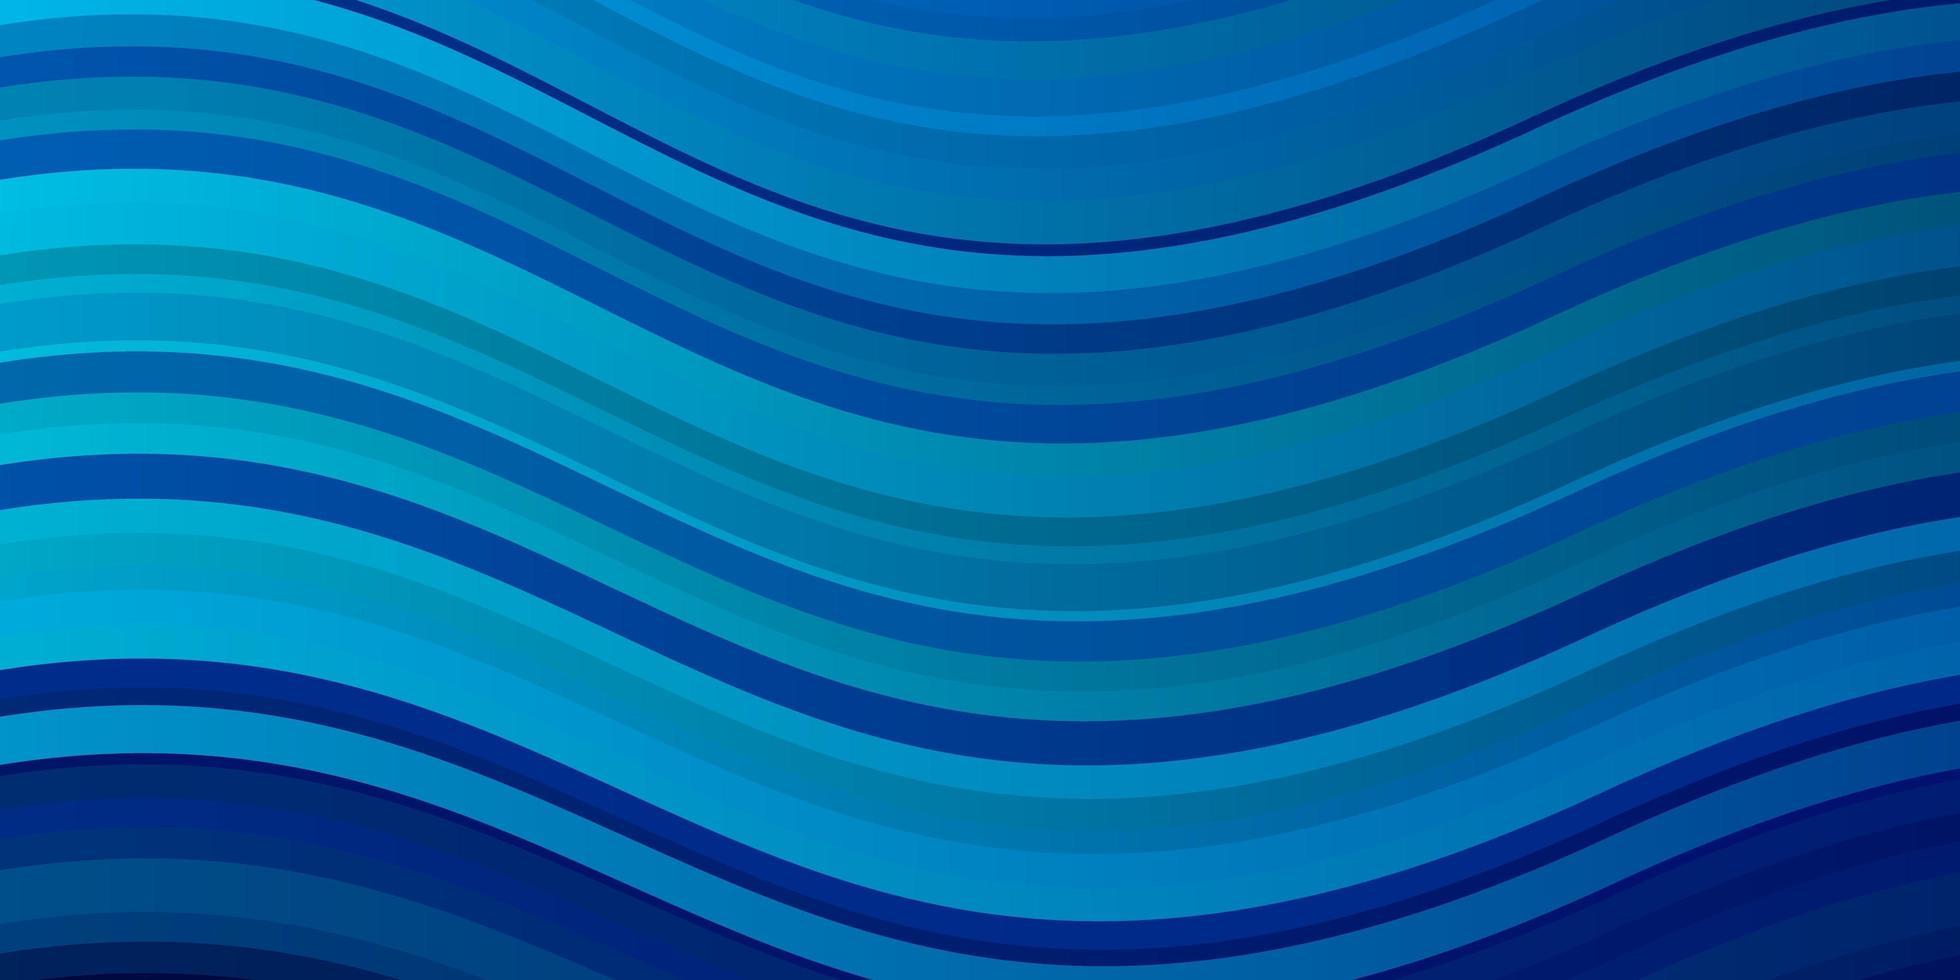 hellblaues Vektormuster mit schiefen Linien. vektor